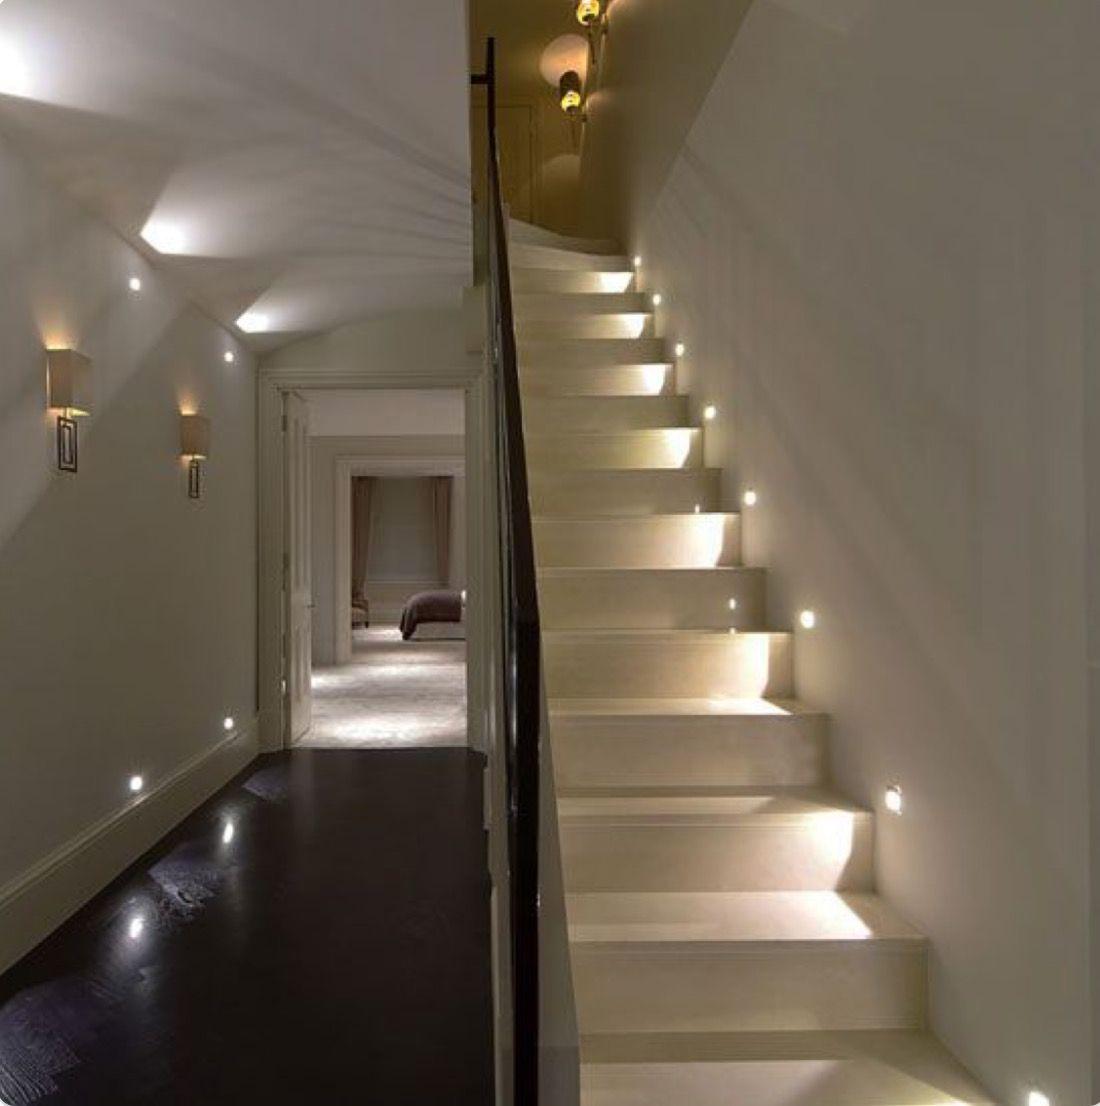 pingl par nasir ali sur stair pinterest escaliers. Black Bedroom Furniture Sets. Home Design Ideas